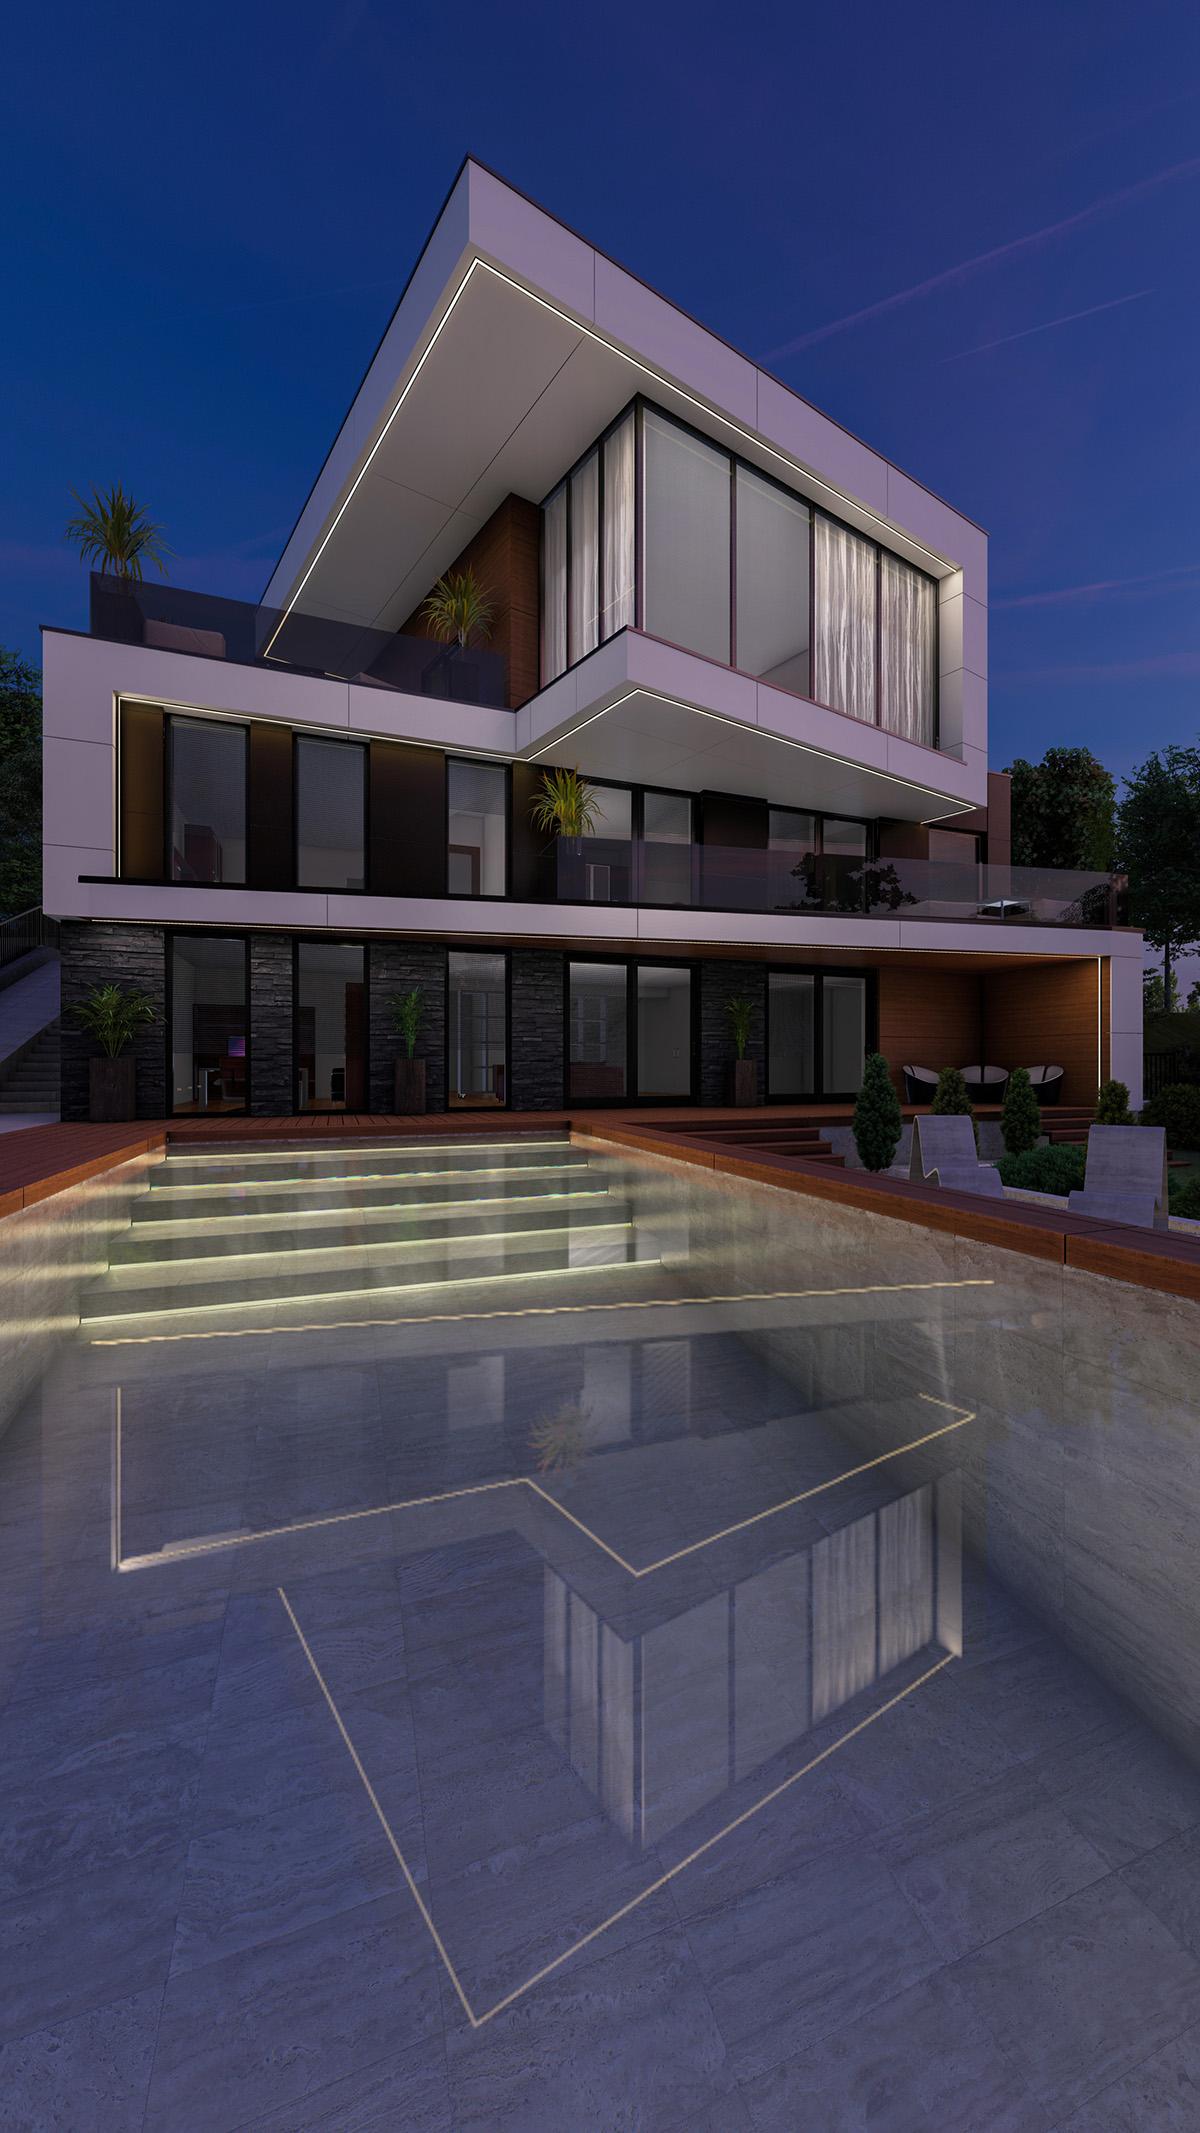 Proiect arhitectural stilului modern in designul casei contemporane cu bazin la aer liber